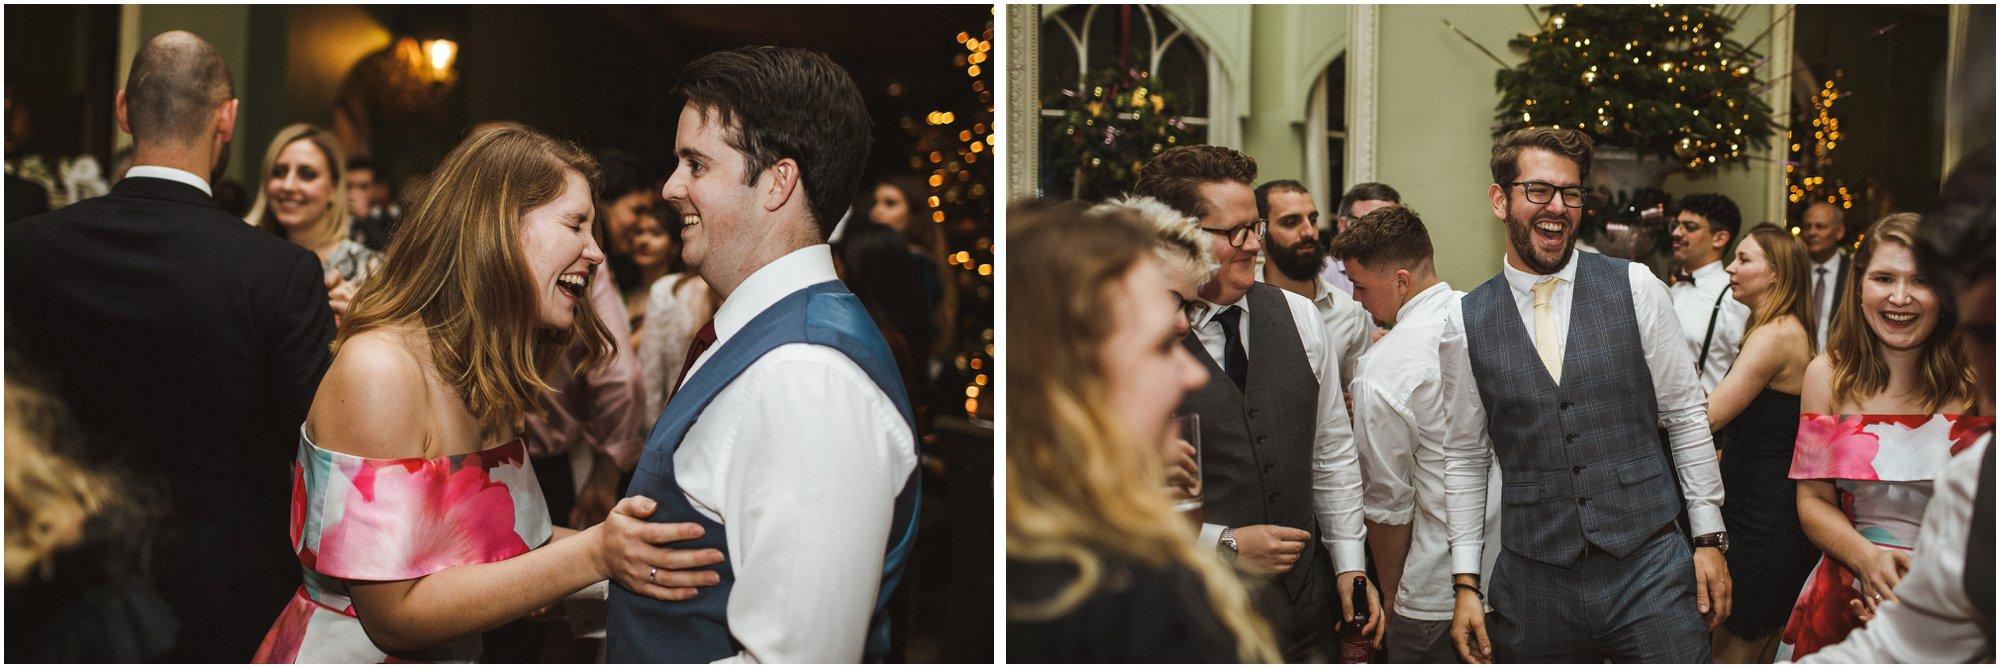 Burghley House Wedding Stamford_0189.jpg